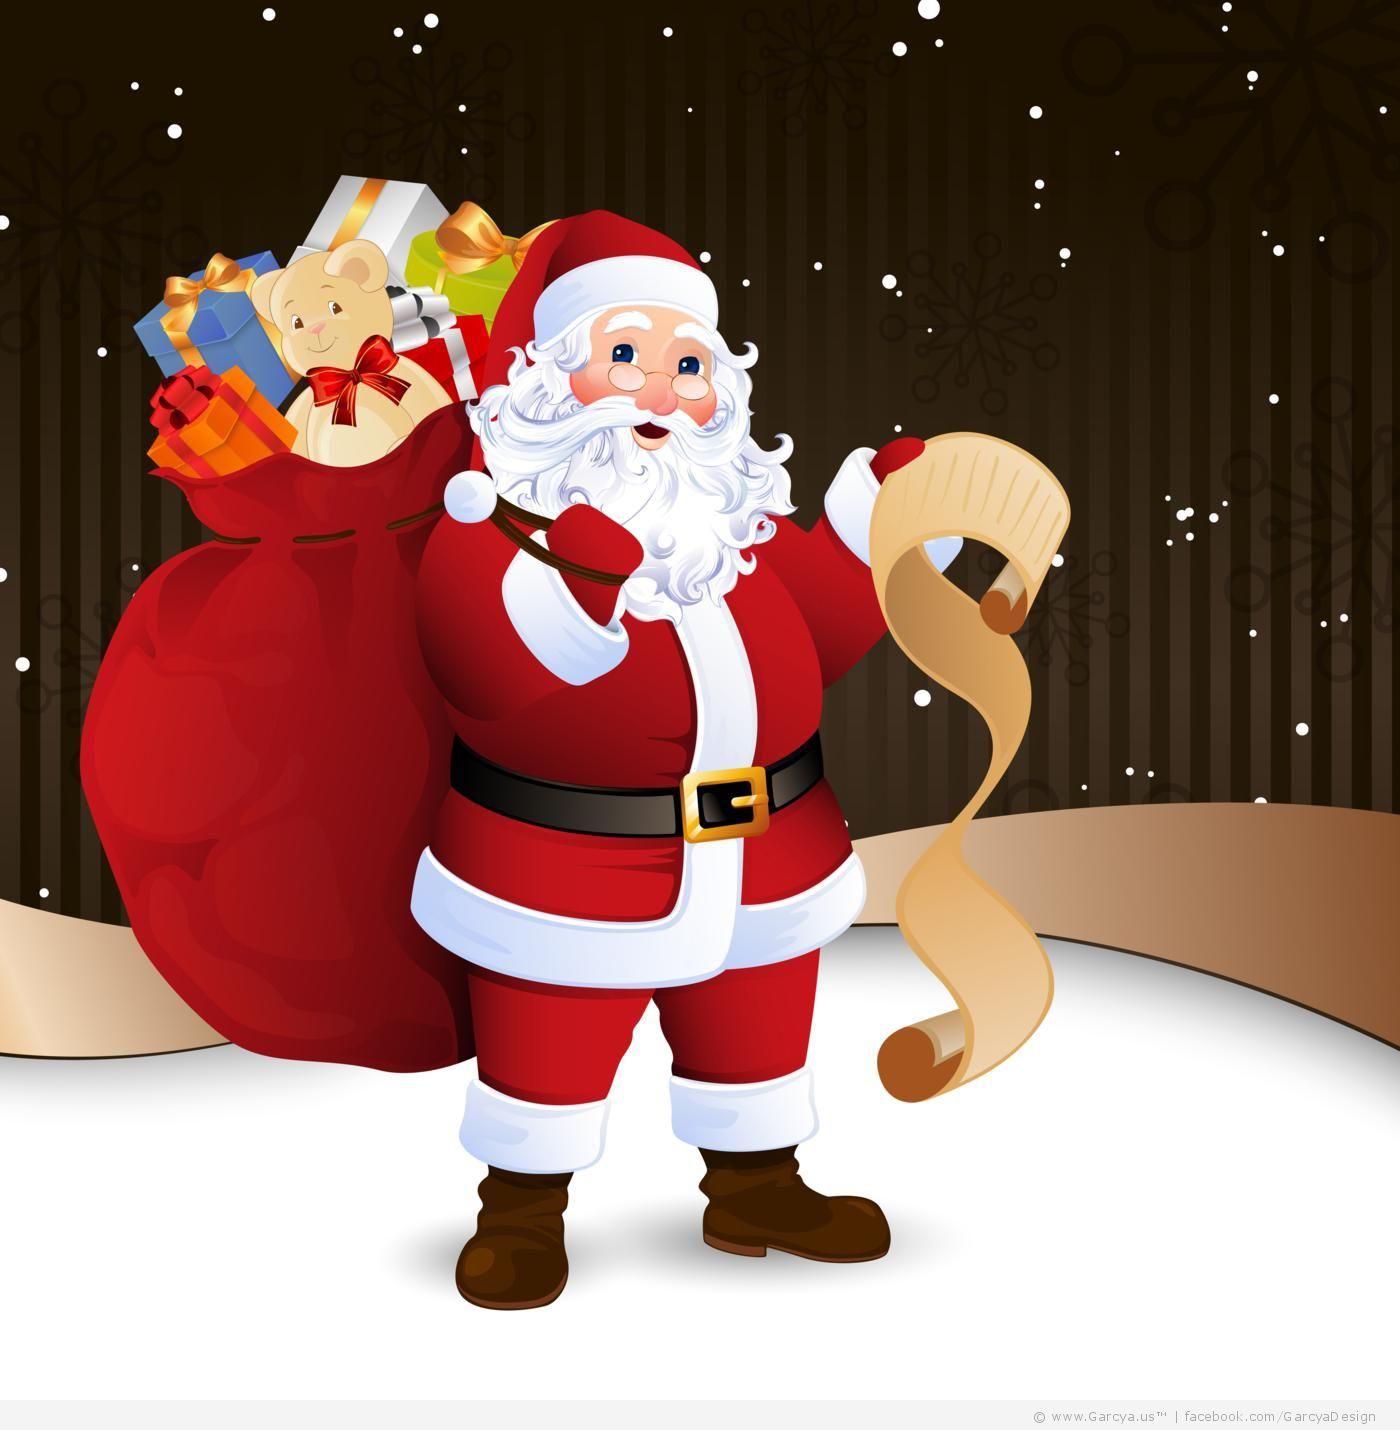 santa claus red nose - Santa Claus Red